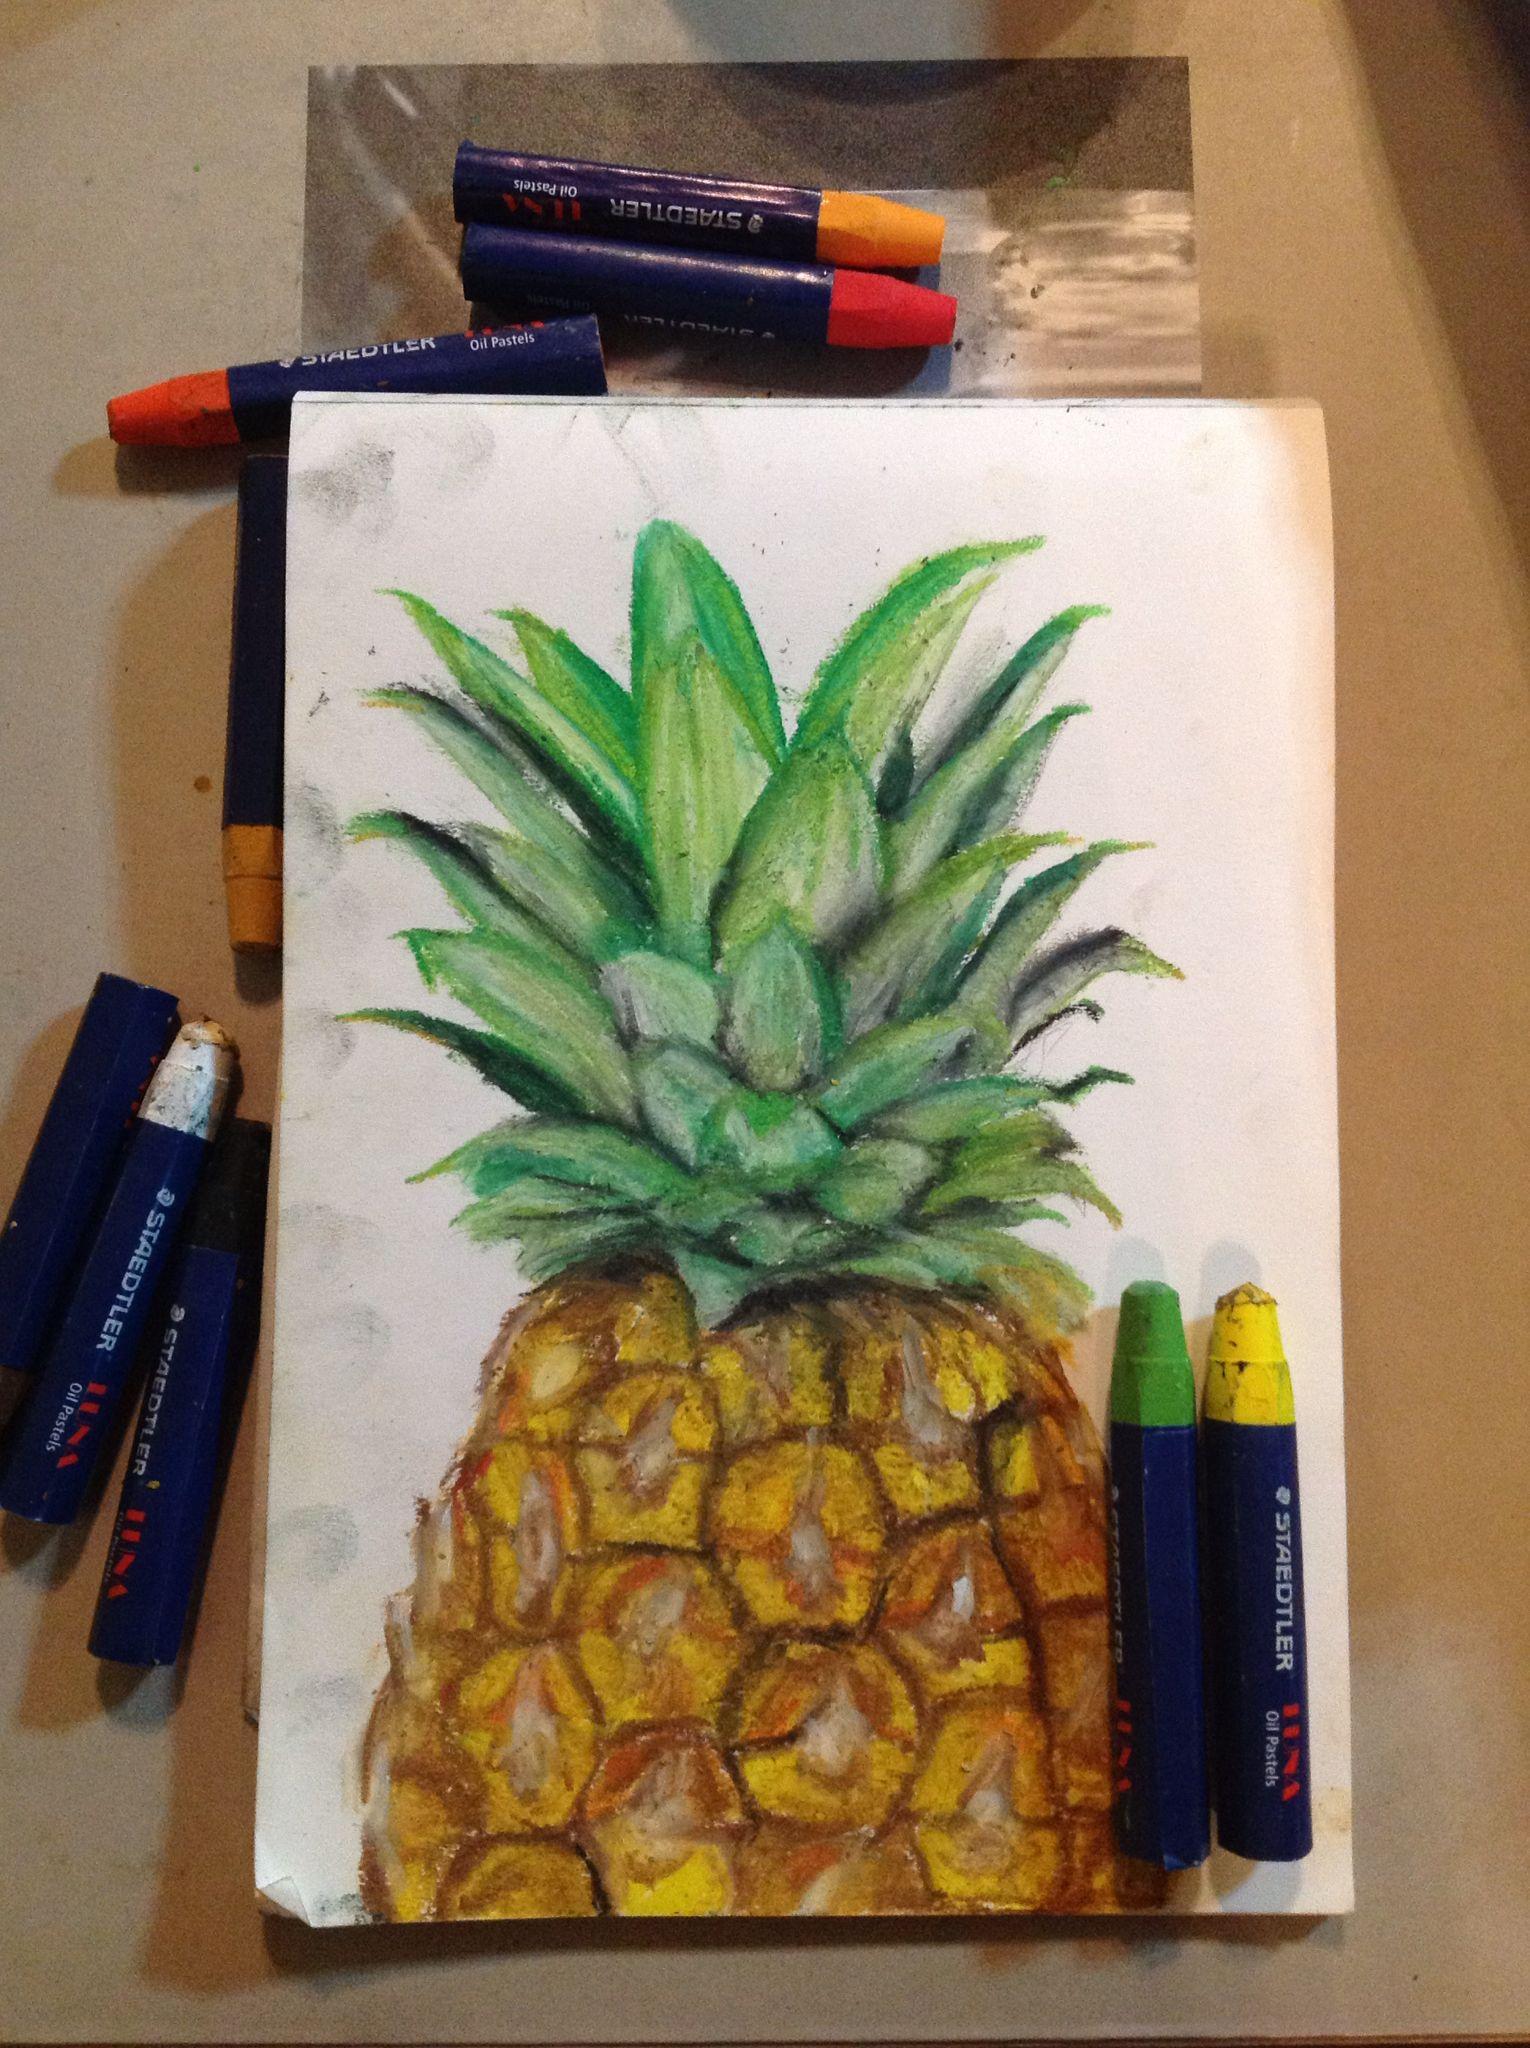 Rainbow landscape original oil pastel drawing - Pineapple Oil Pastel Painting Art Pineapple Fruit Oil Pastels Tonal Study